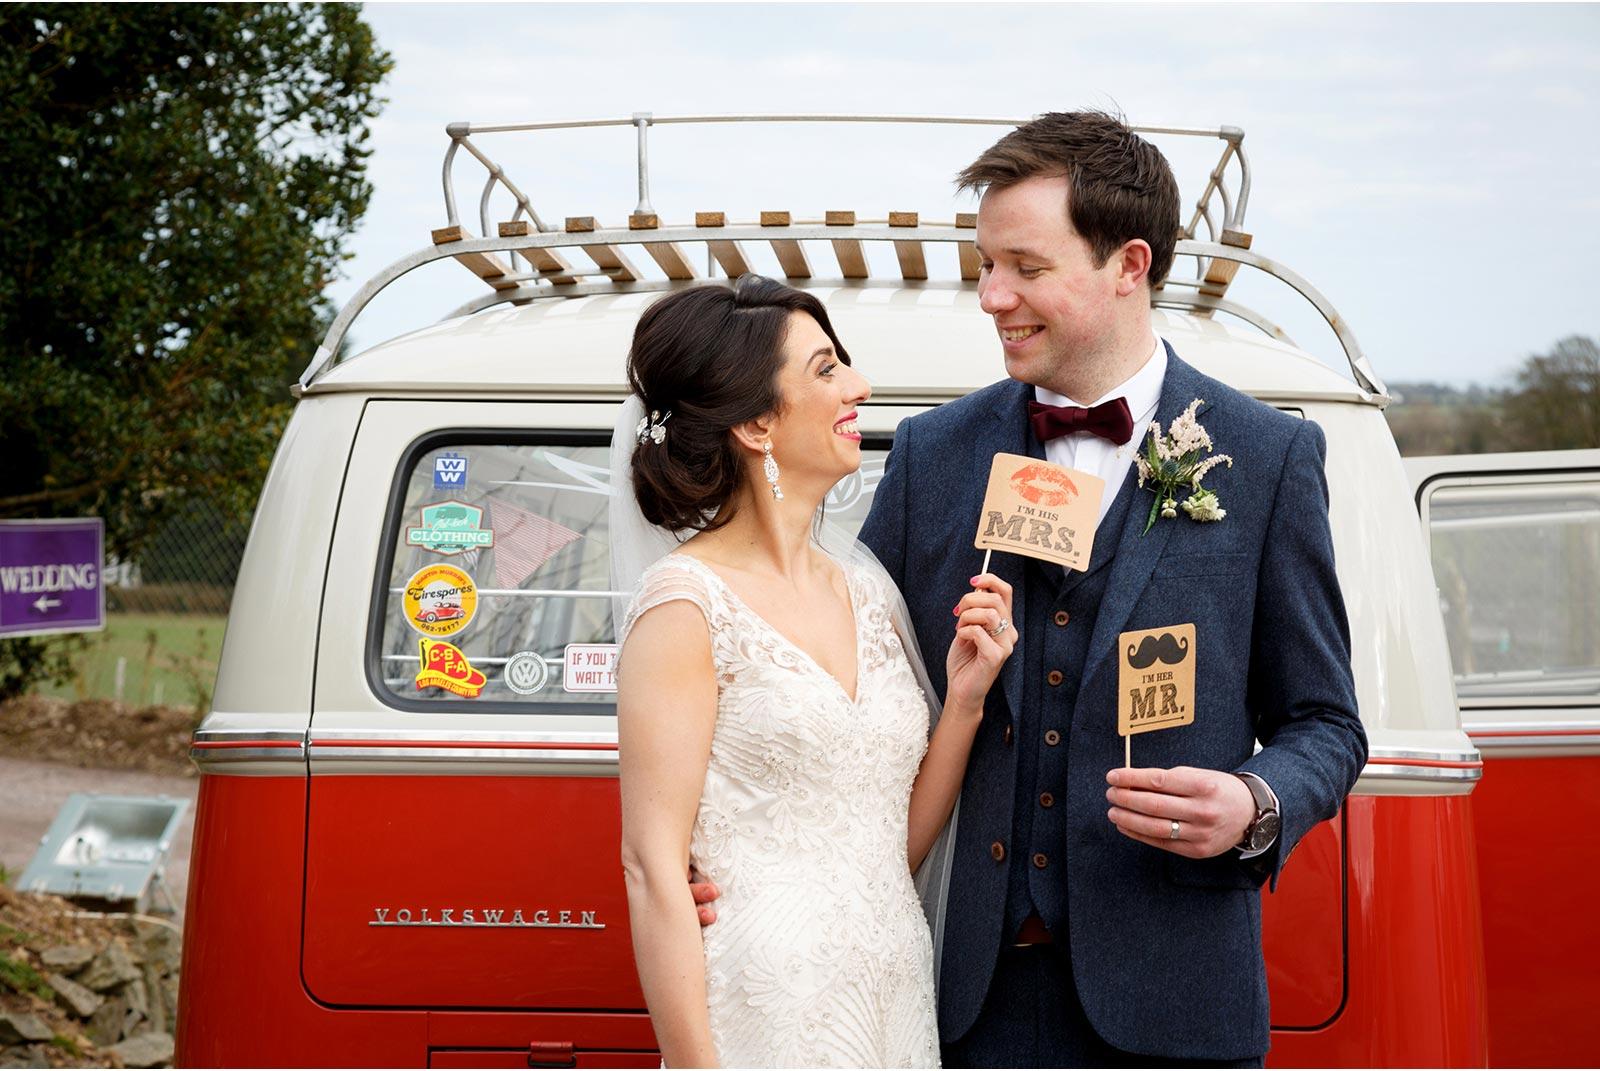 couple pose at their red VW camper van